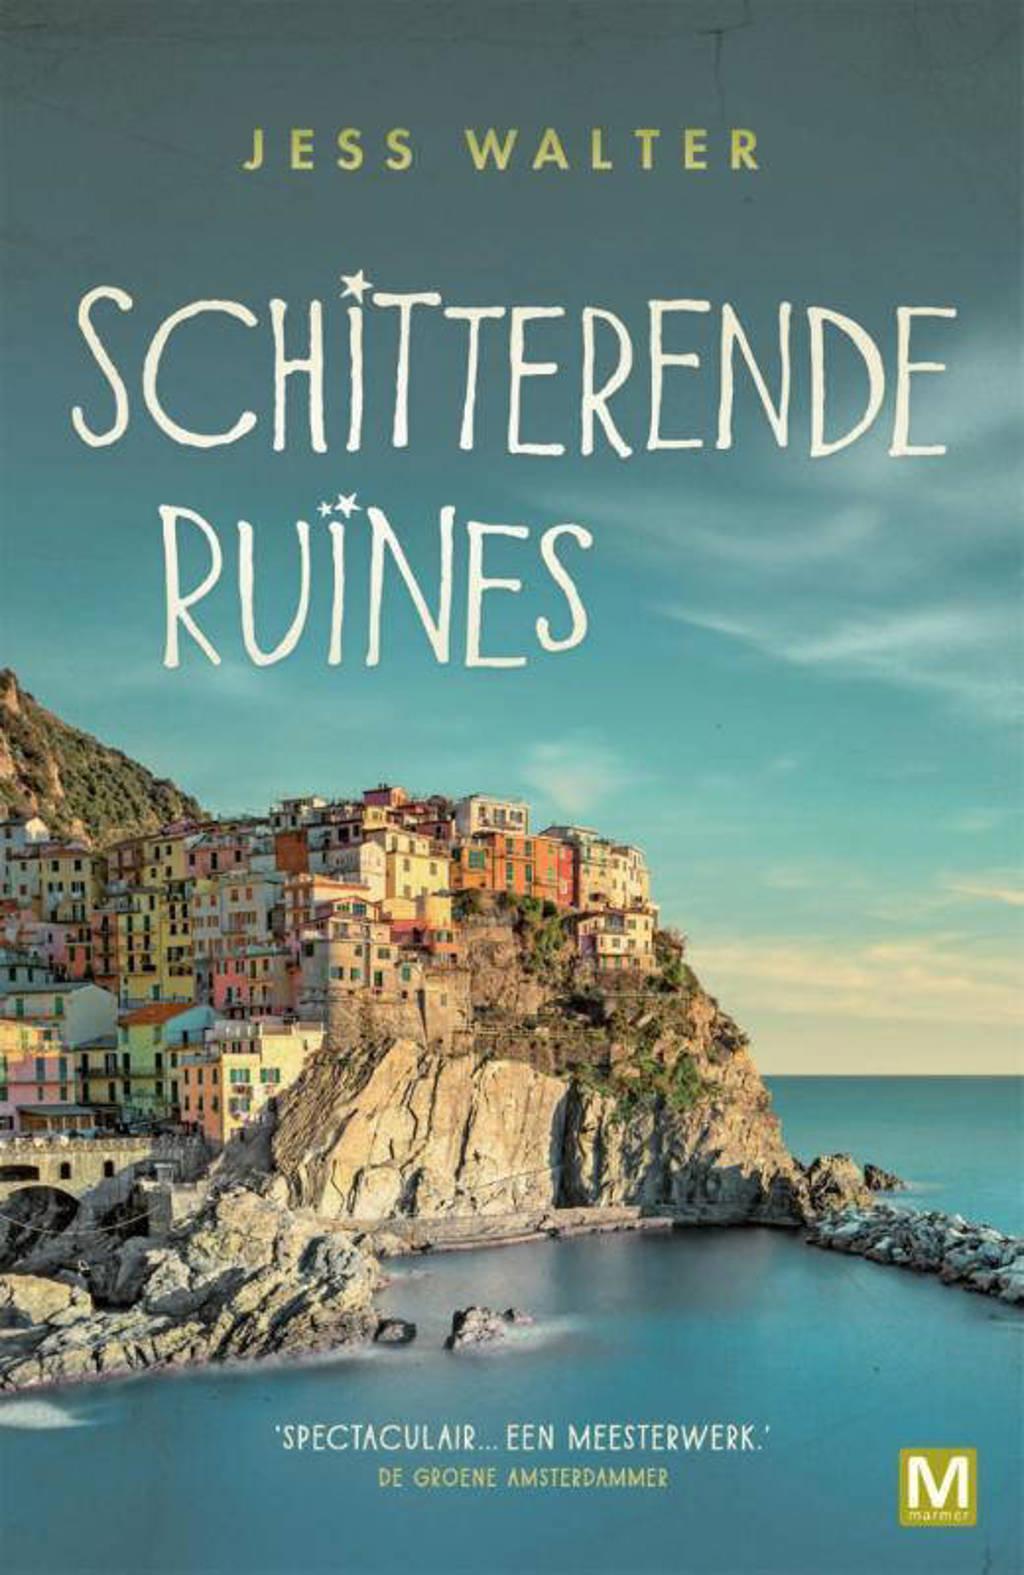 Pakket Schitterende ruines - Jess Walter